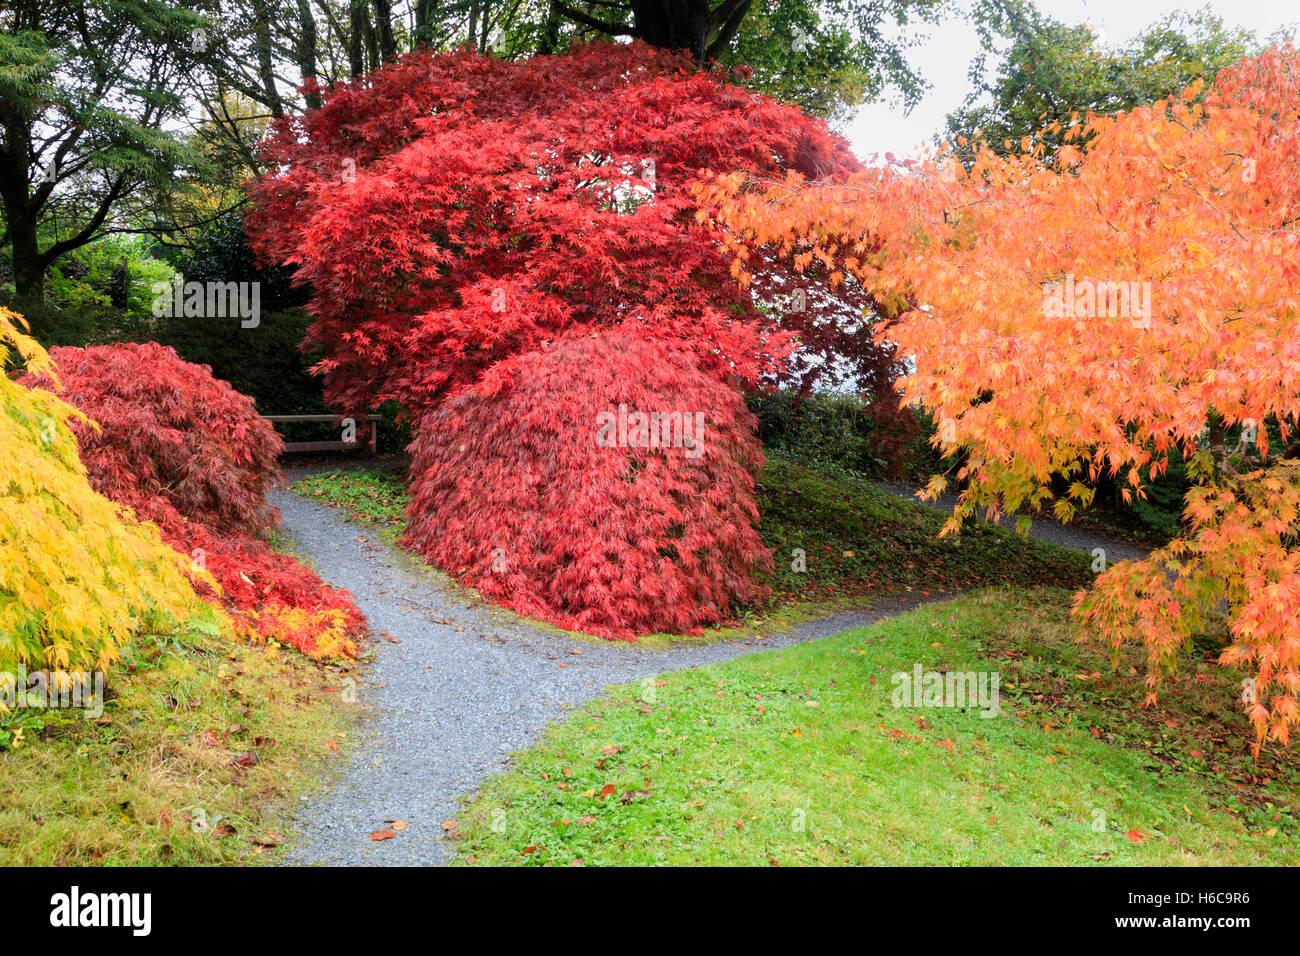 reds-yellow-and-orange-autumn-leaf-colour-from-acer-palmatum-varietes-H6C9R6.jpg